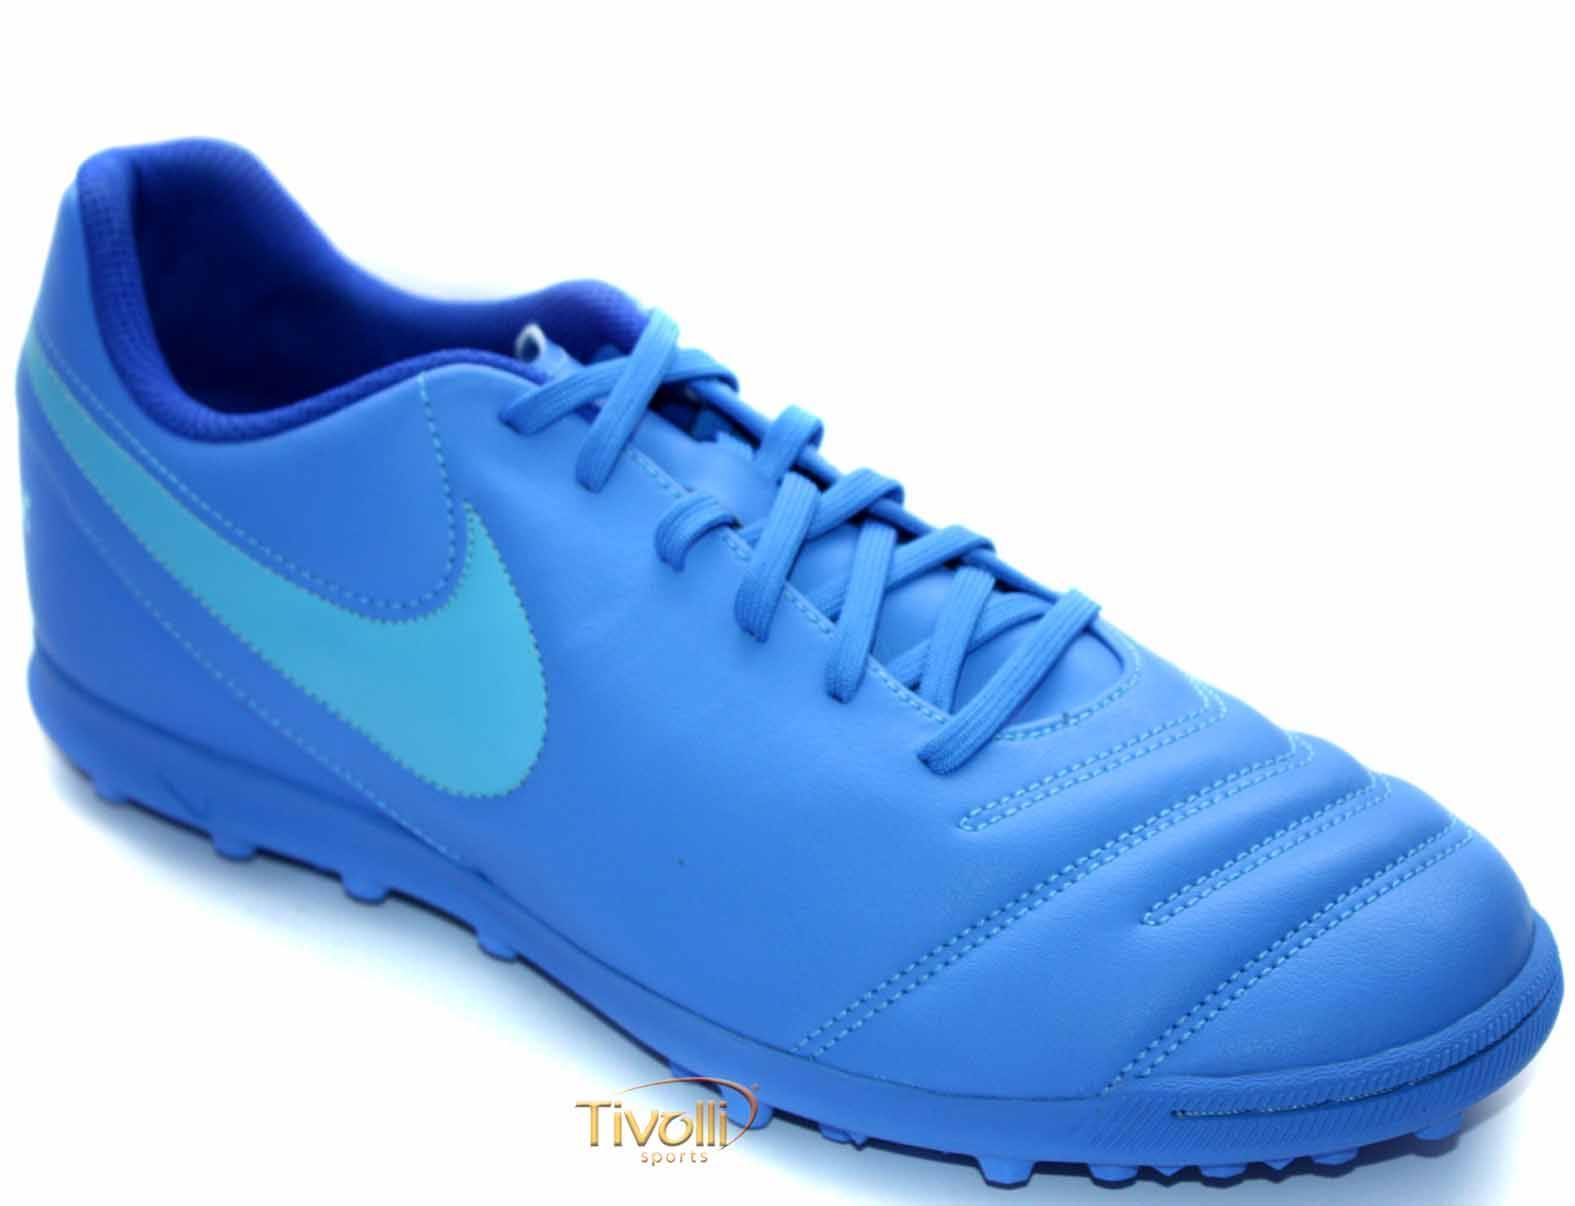 Chuteira Nike Tiempo Rio III TF Society     4a3886c8eb9f8